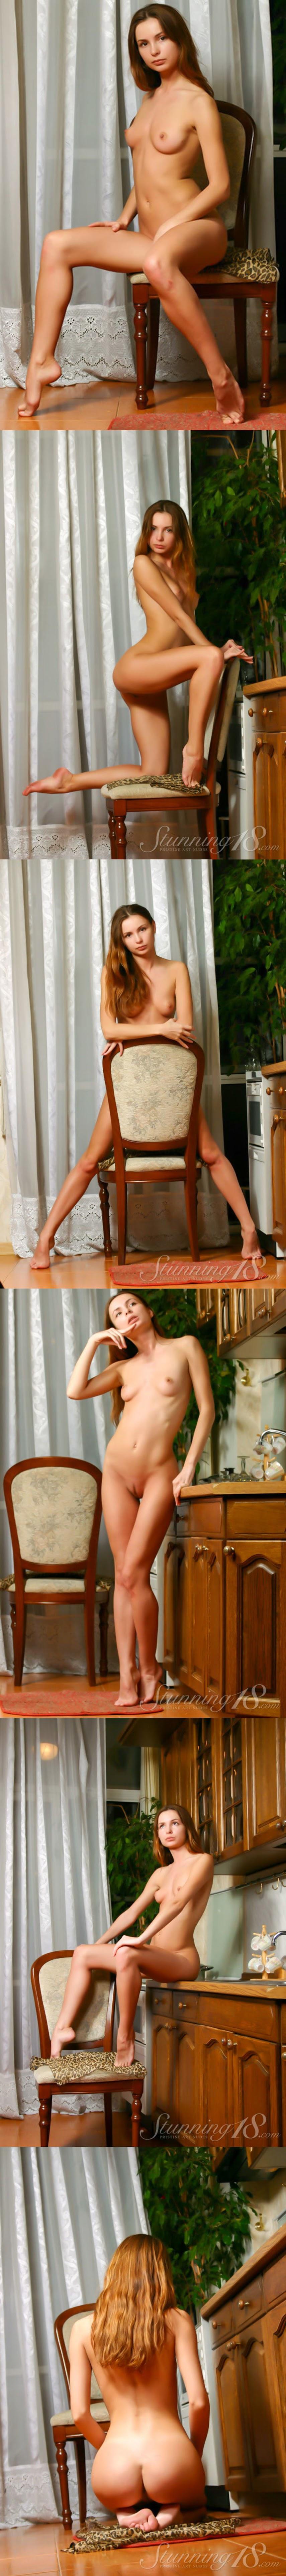 2907888754 [Stunning18] Tiara - She's a Sexpot stunning18 08180